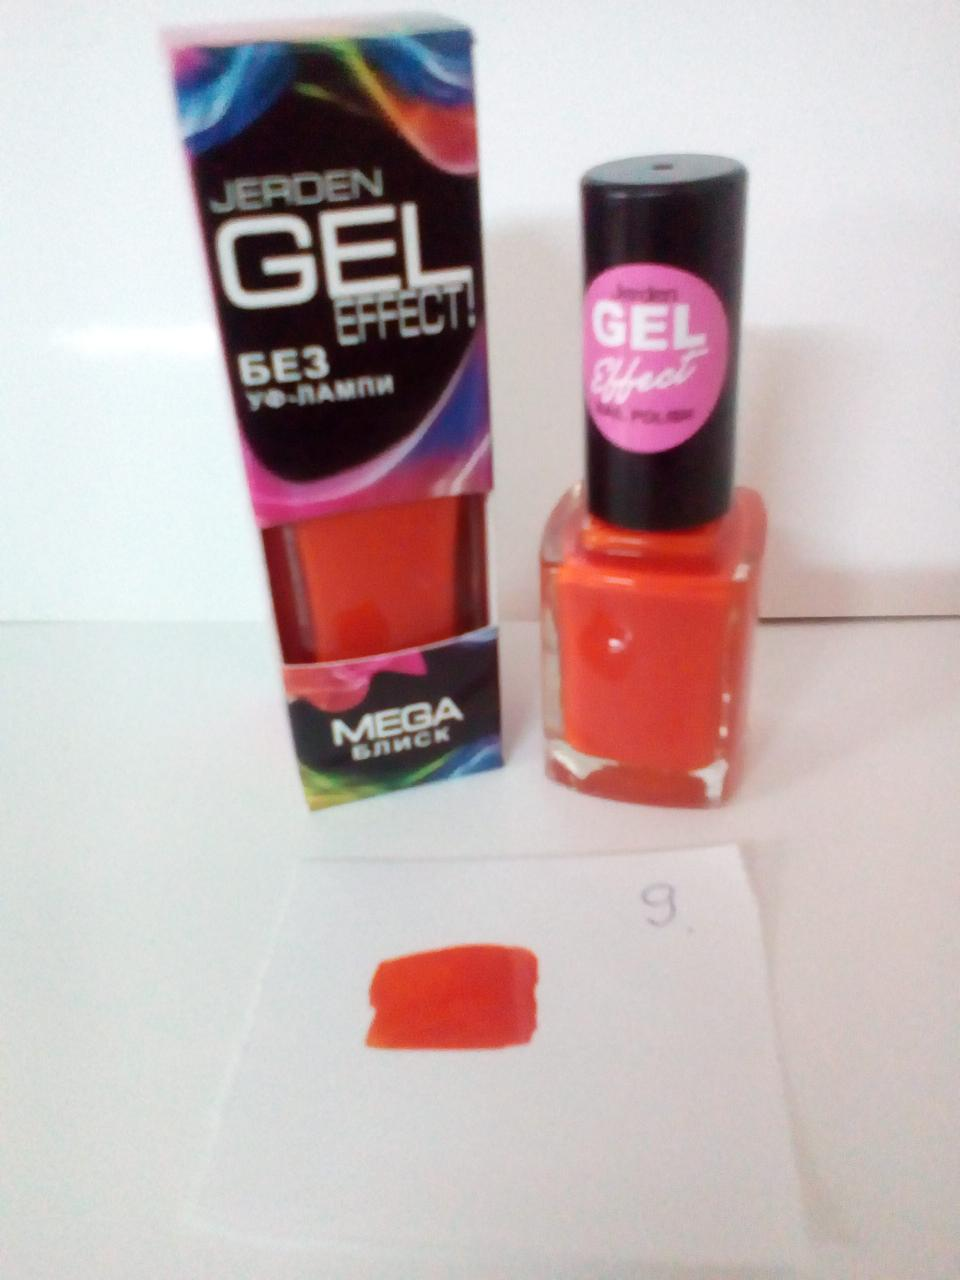 Лак для ногтей Jerden Gel Effect №9 (mandarin) (9мл)